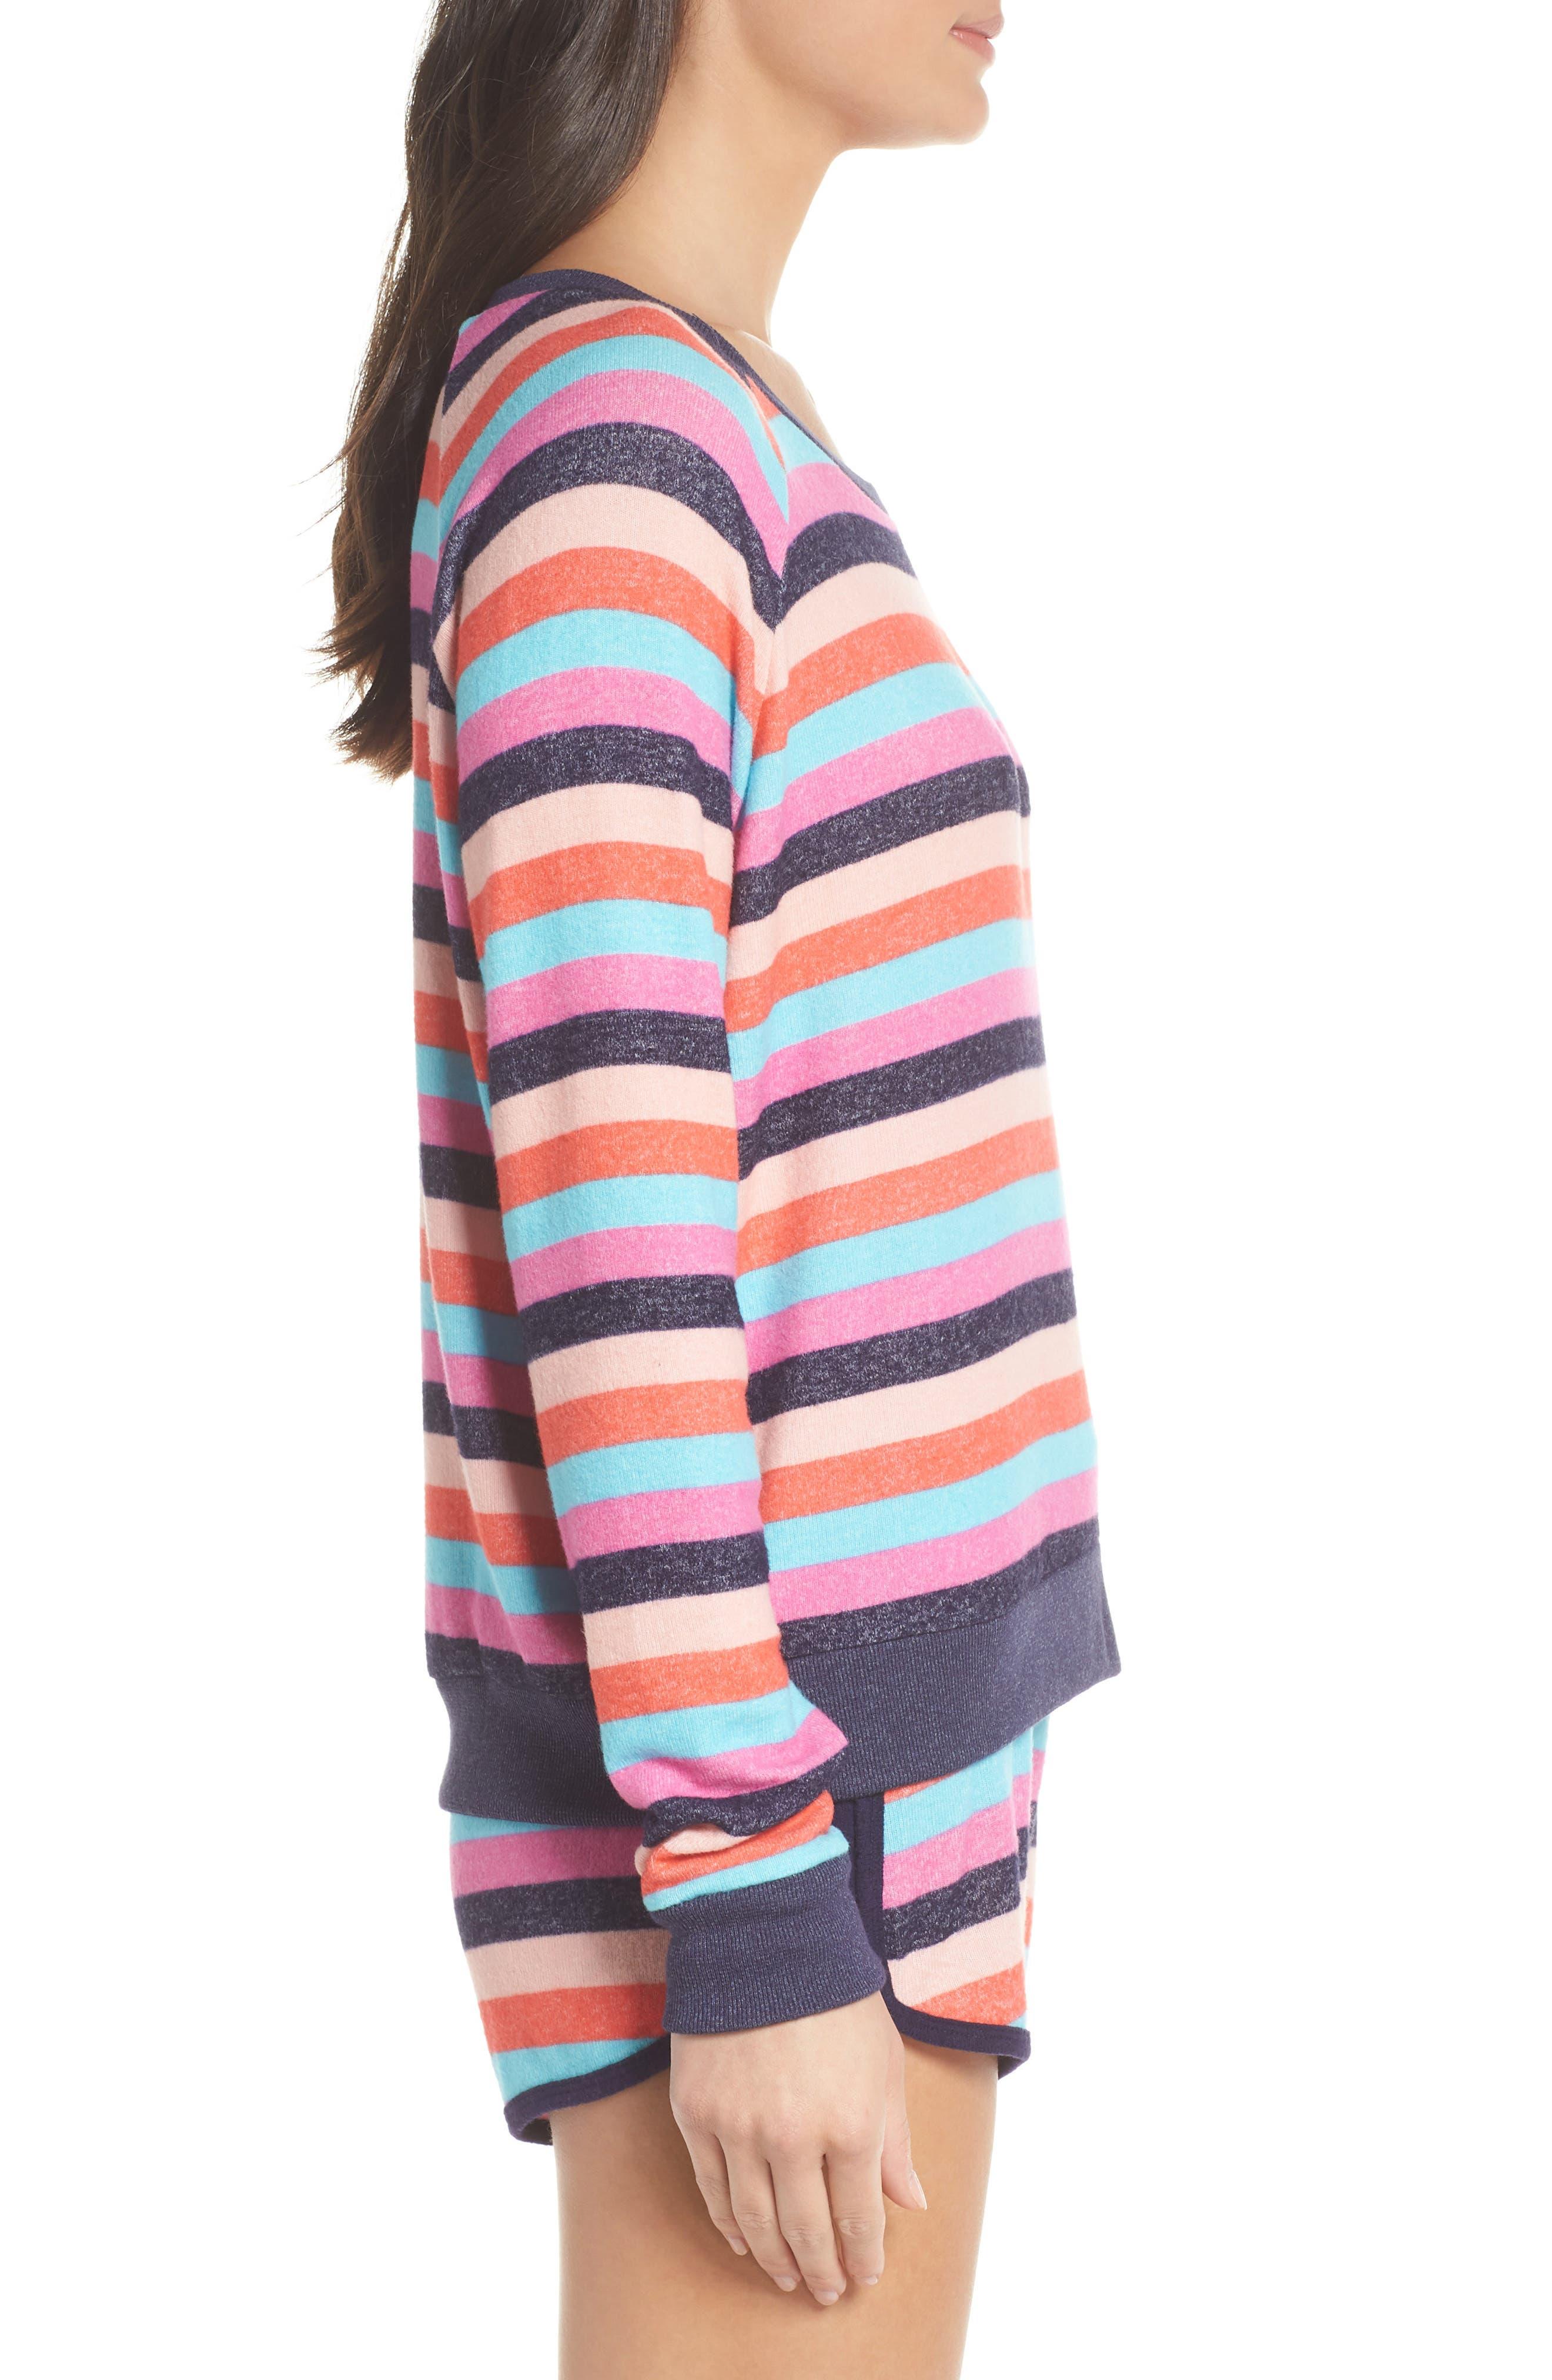 Cozy Crew Raglan Sweatshirt,                             Alternate thumbnail 3, color,                             Navy Dusk Milli Multi Stripe